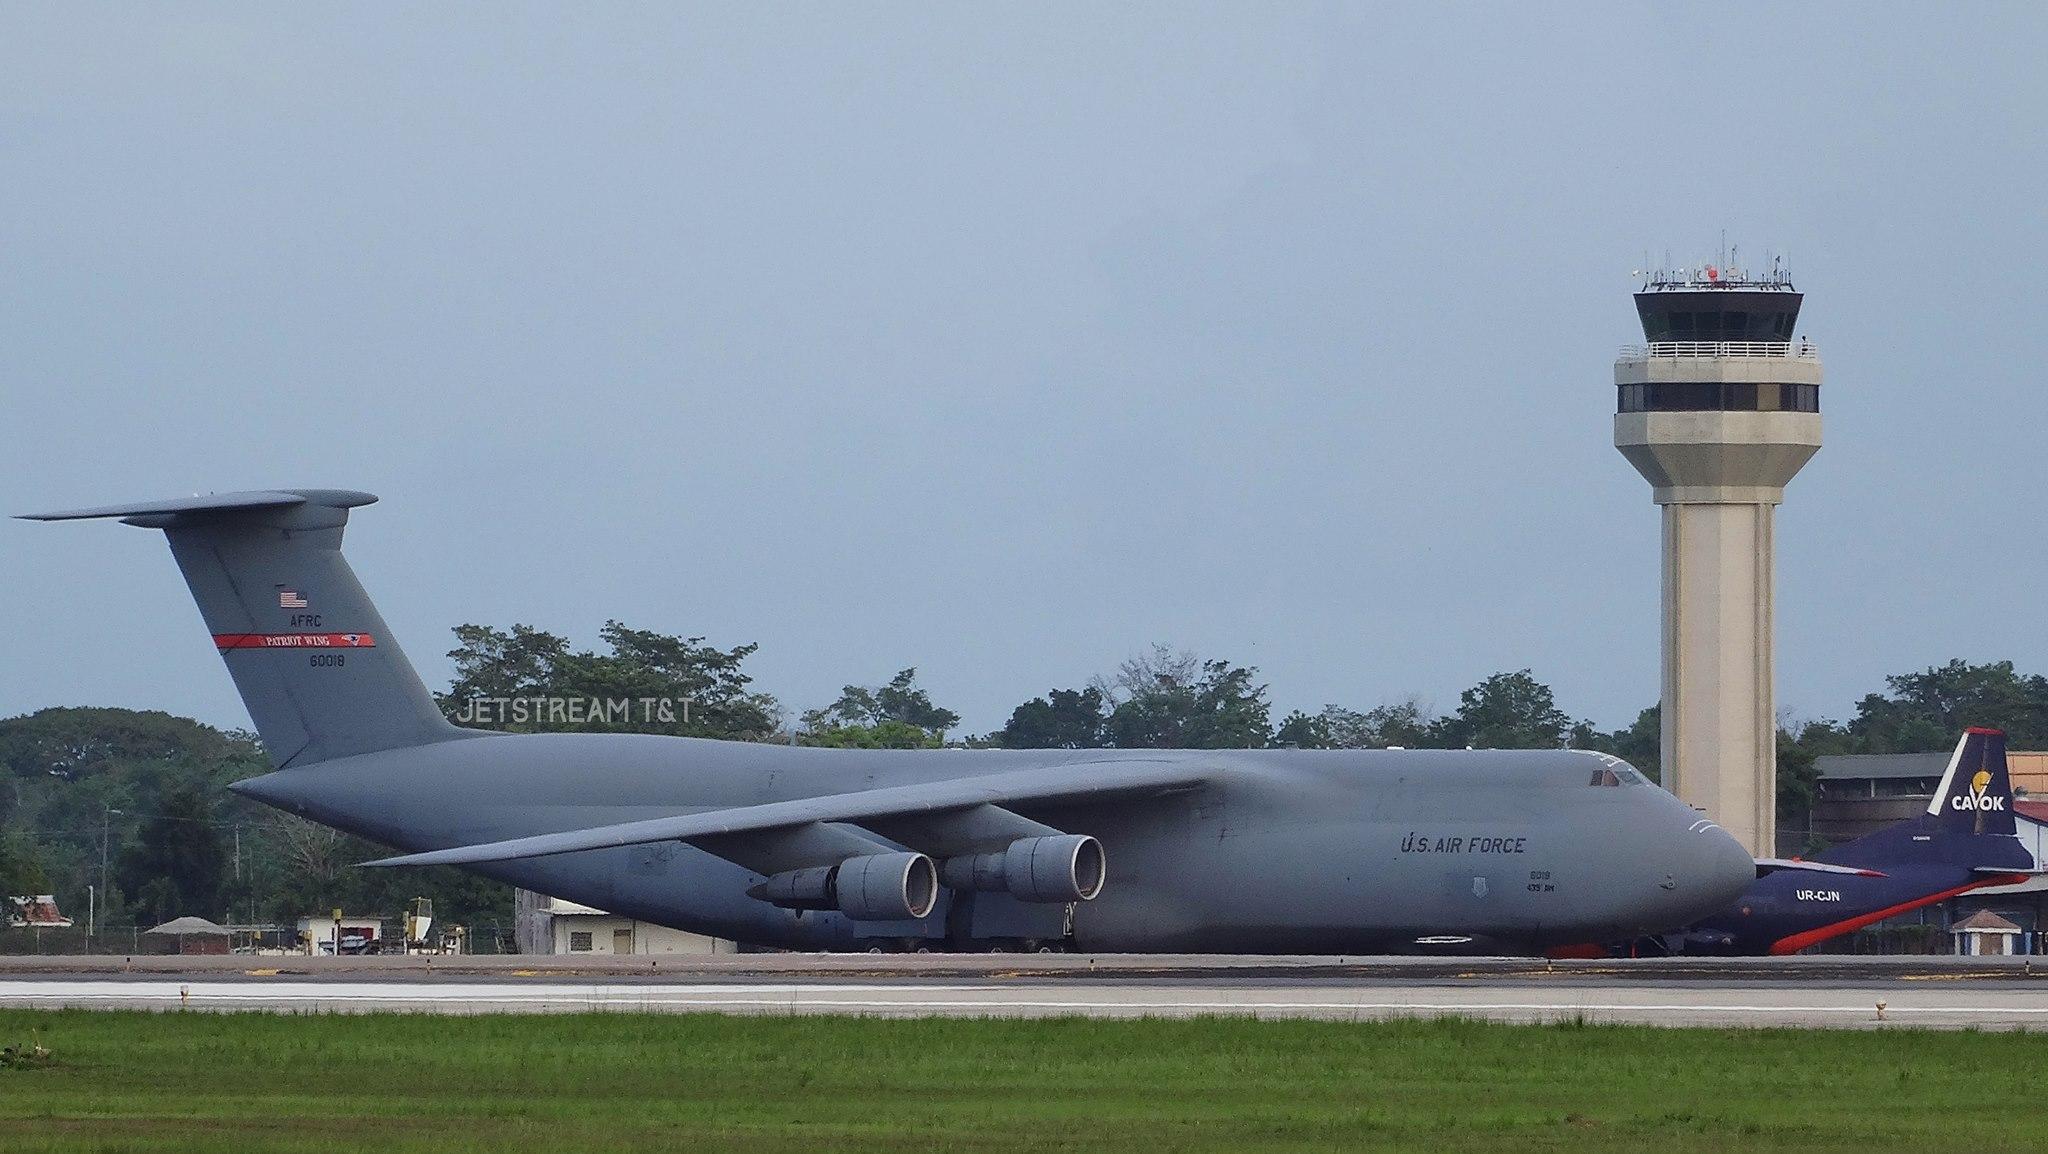 us air force c5 galaxy class aircraft at piarco